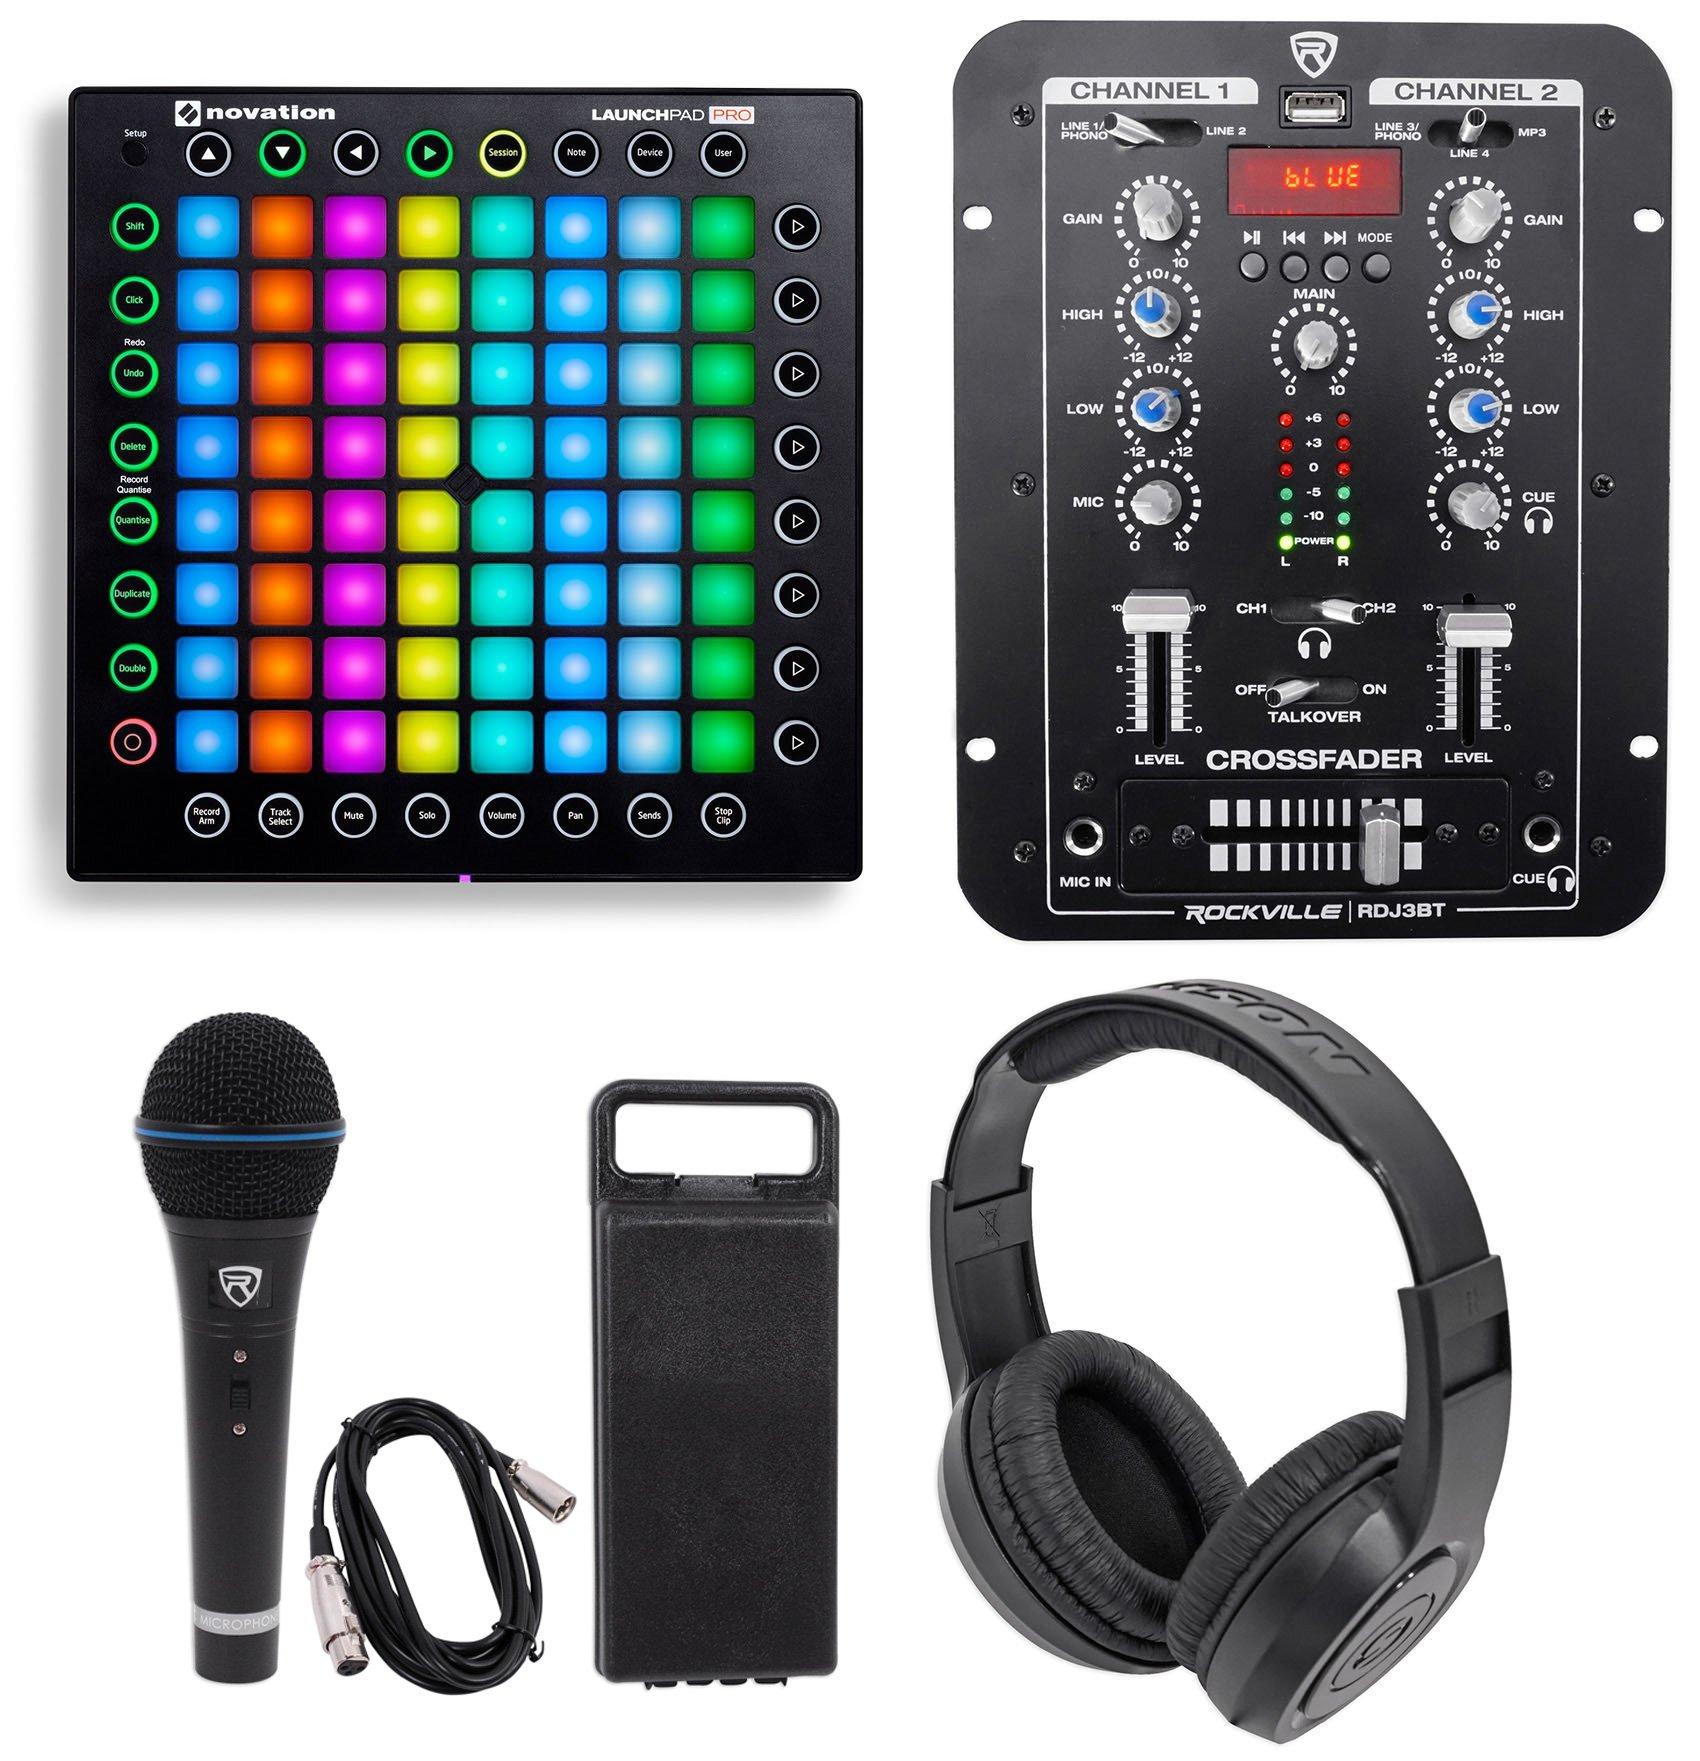 Novation Launchpad Pro USB MIDI RGB 64-Pad DJ Controller+Mixer+Headphones+Mic by Novation